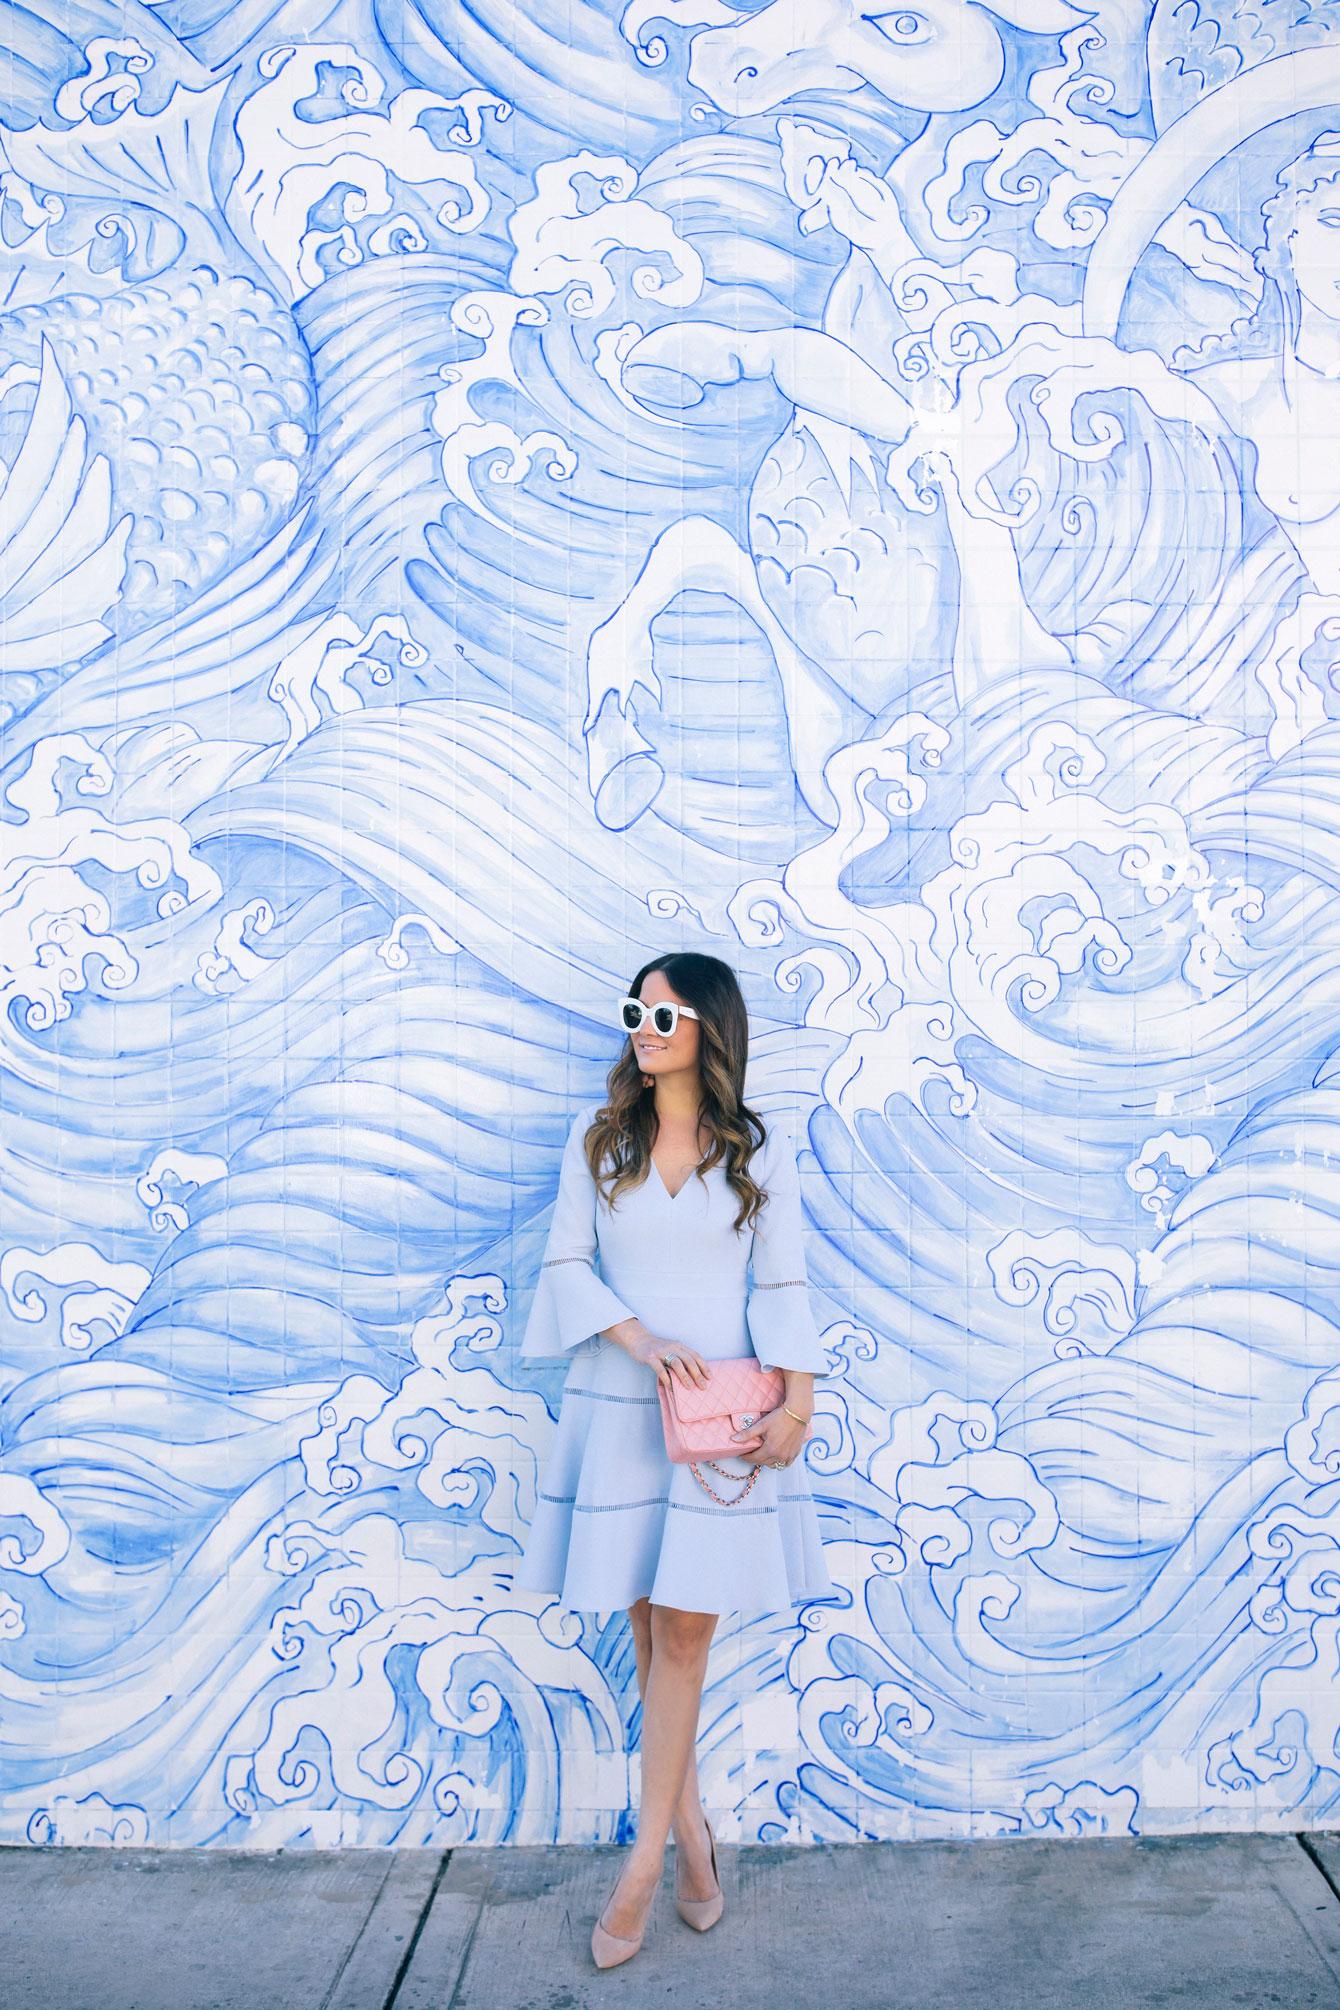 Miami Street Art Mural Guide